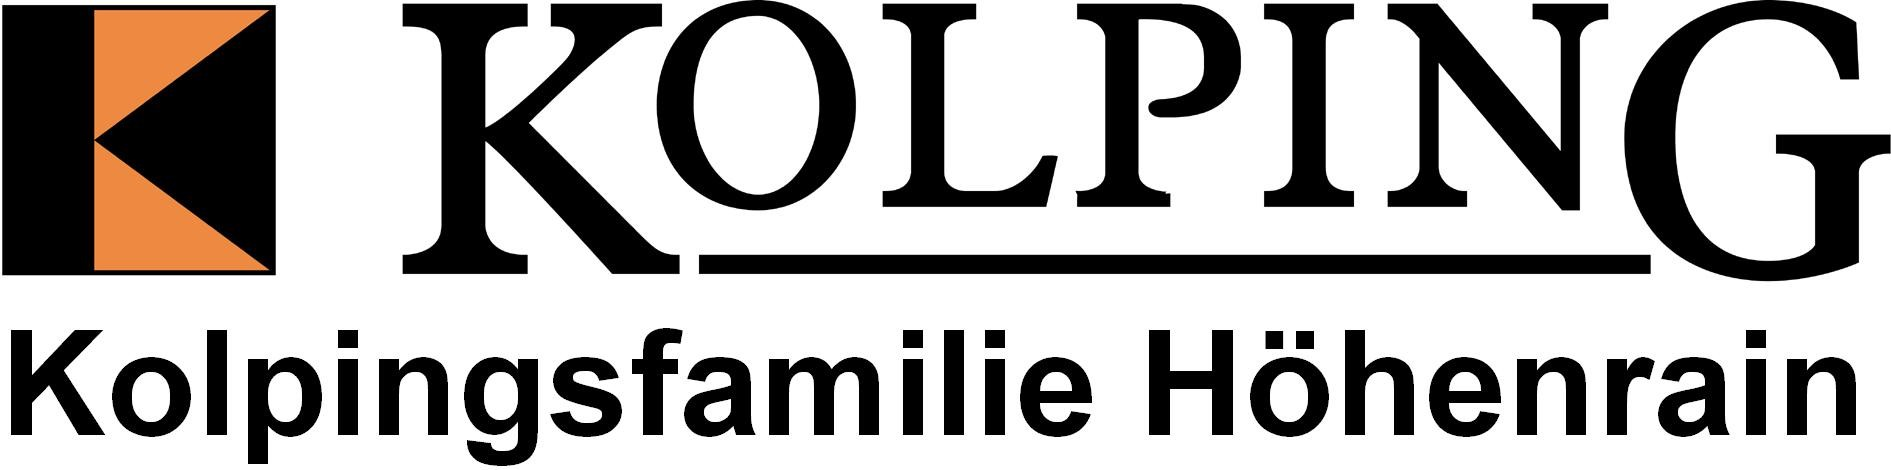 Kolpingsfamilie Höhenrain